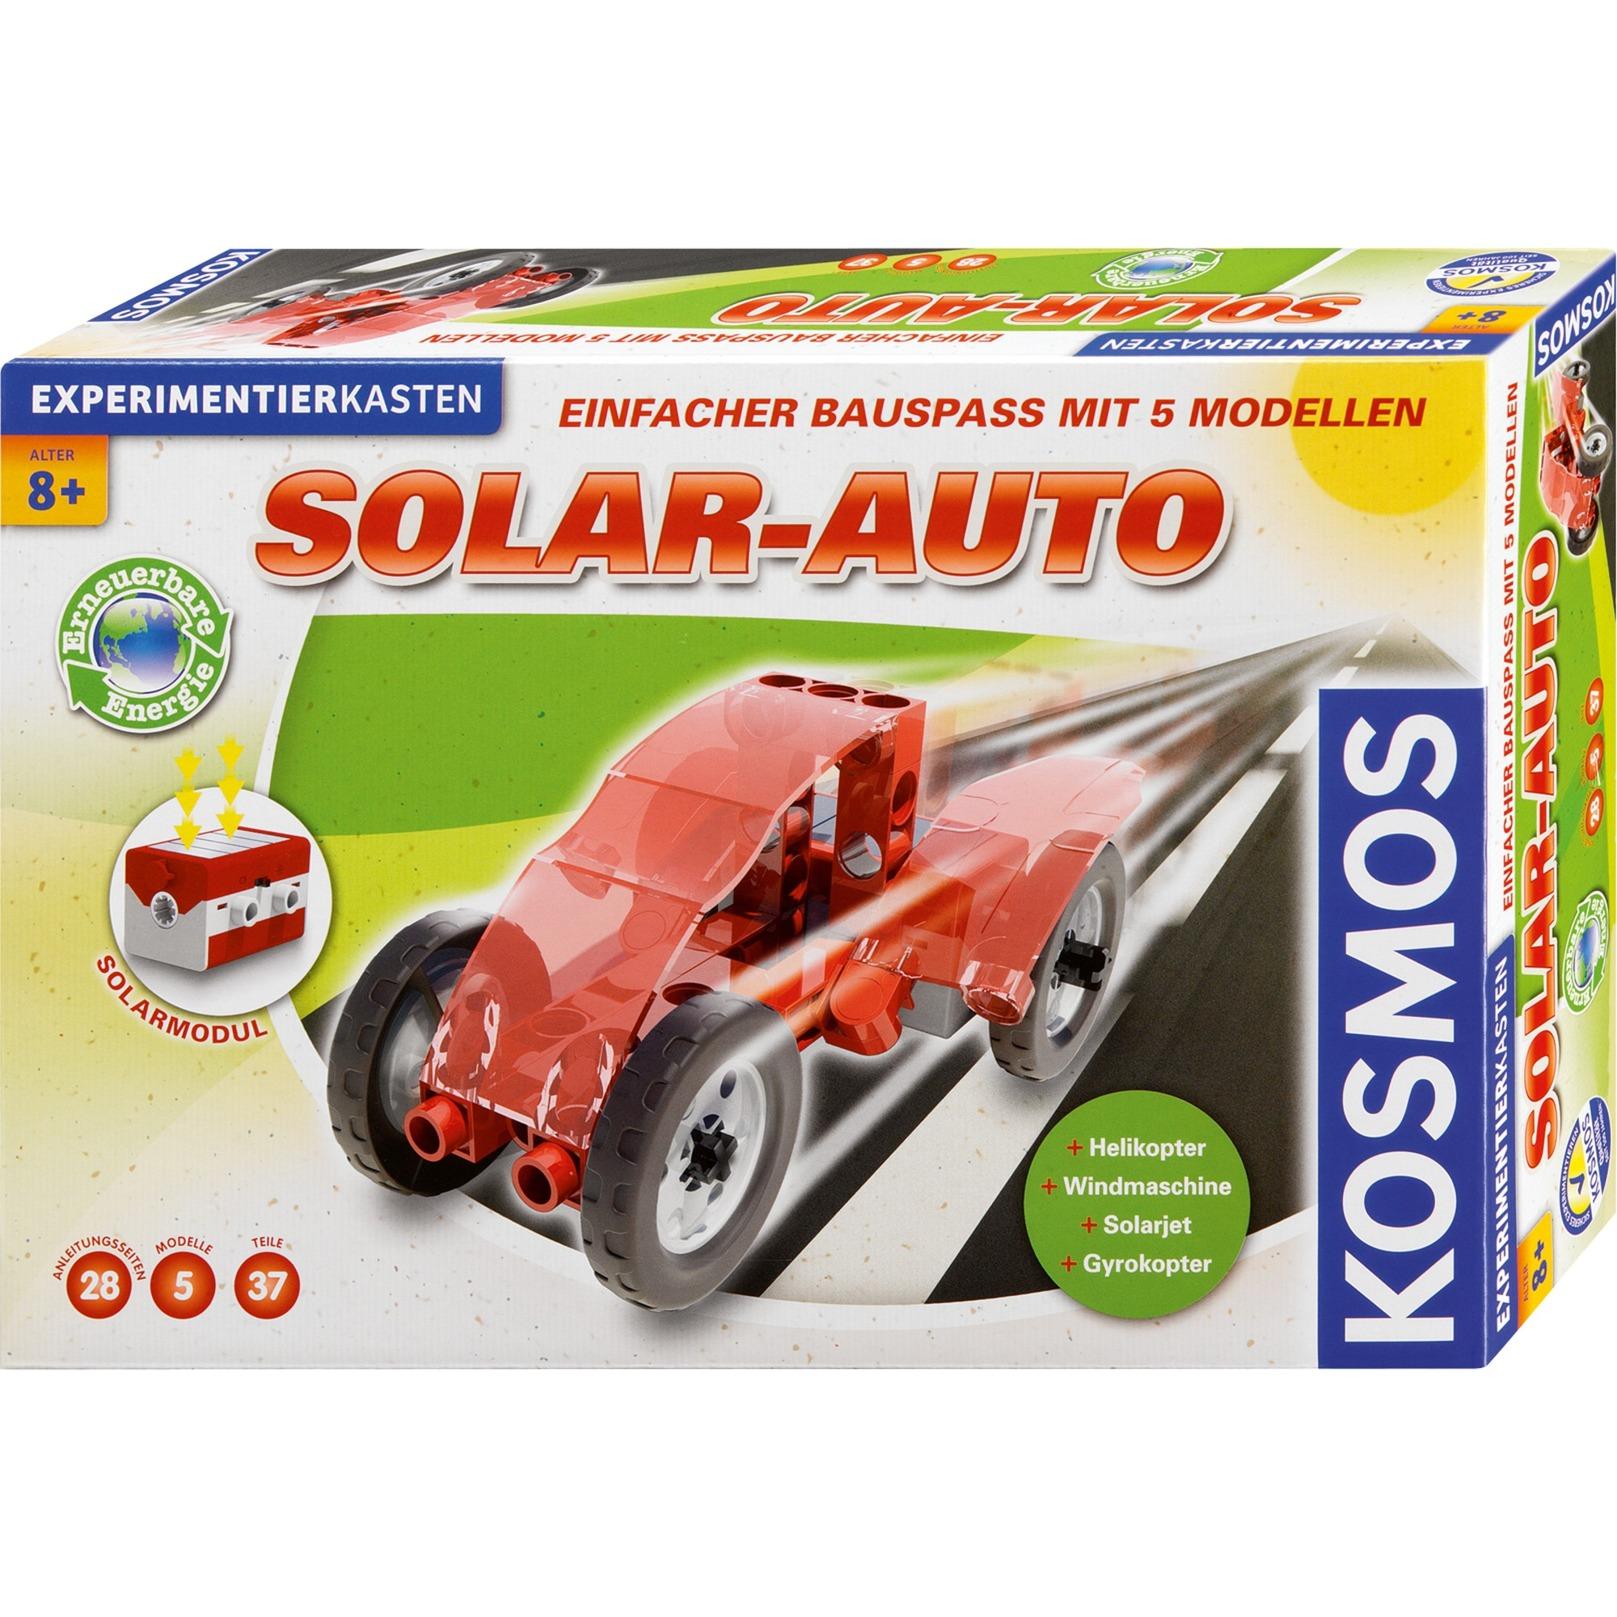 solar-auto-borne-videnskabssat-legetoj-eksperimenter-og-magic-box-tryllekasse